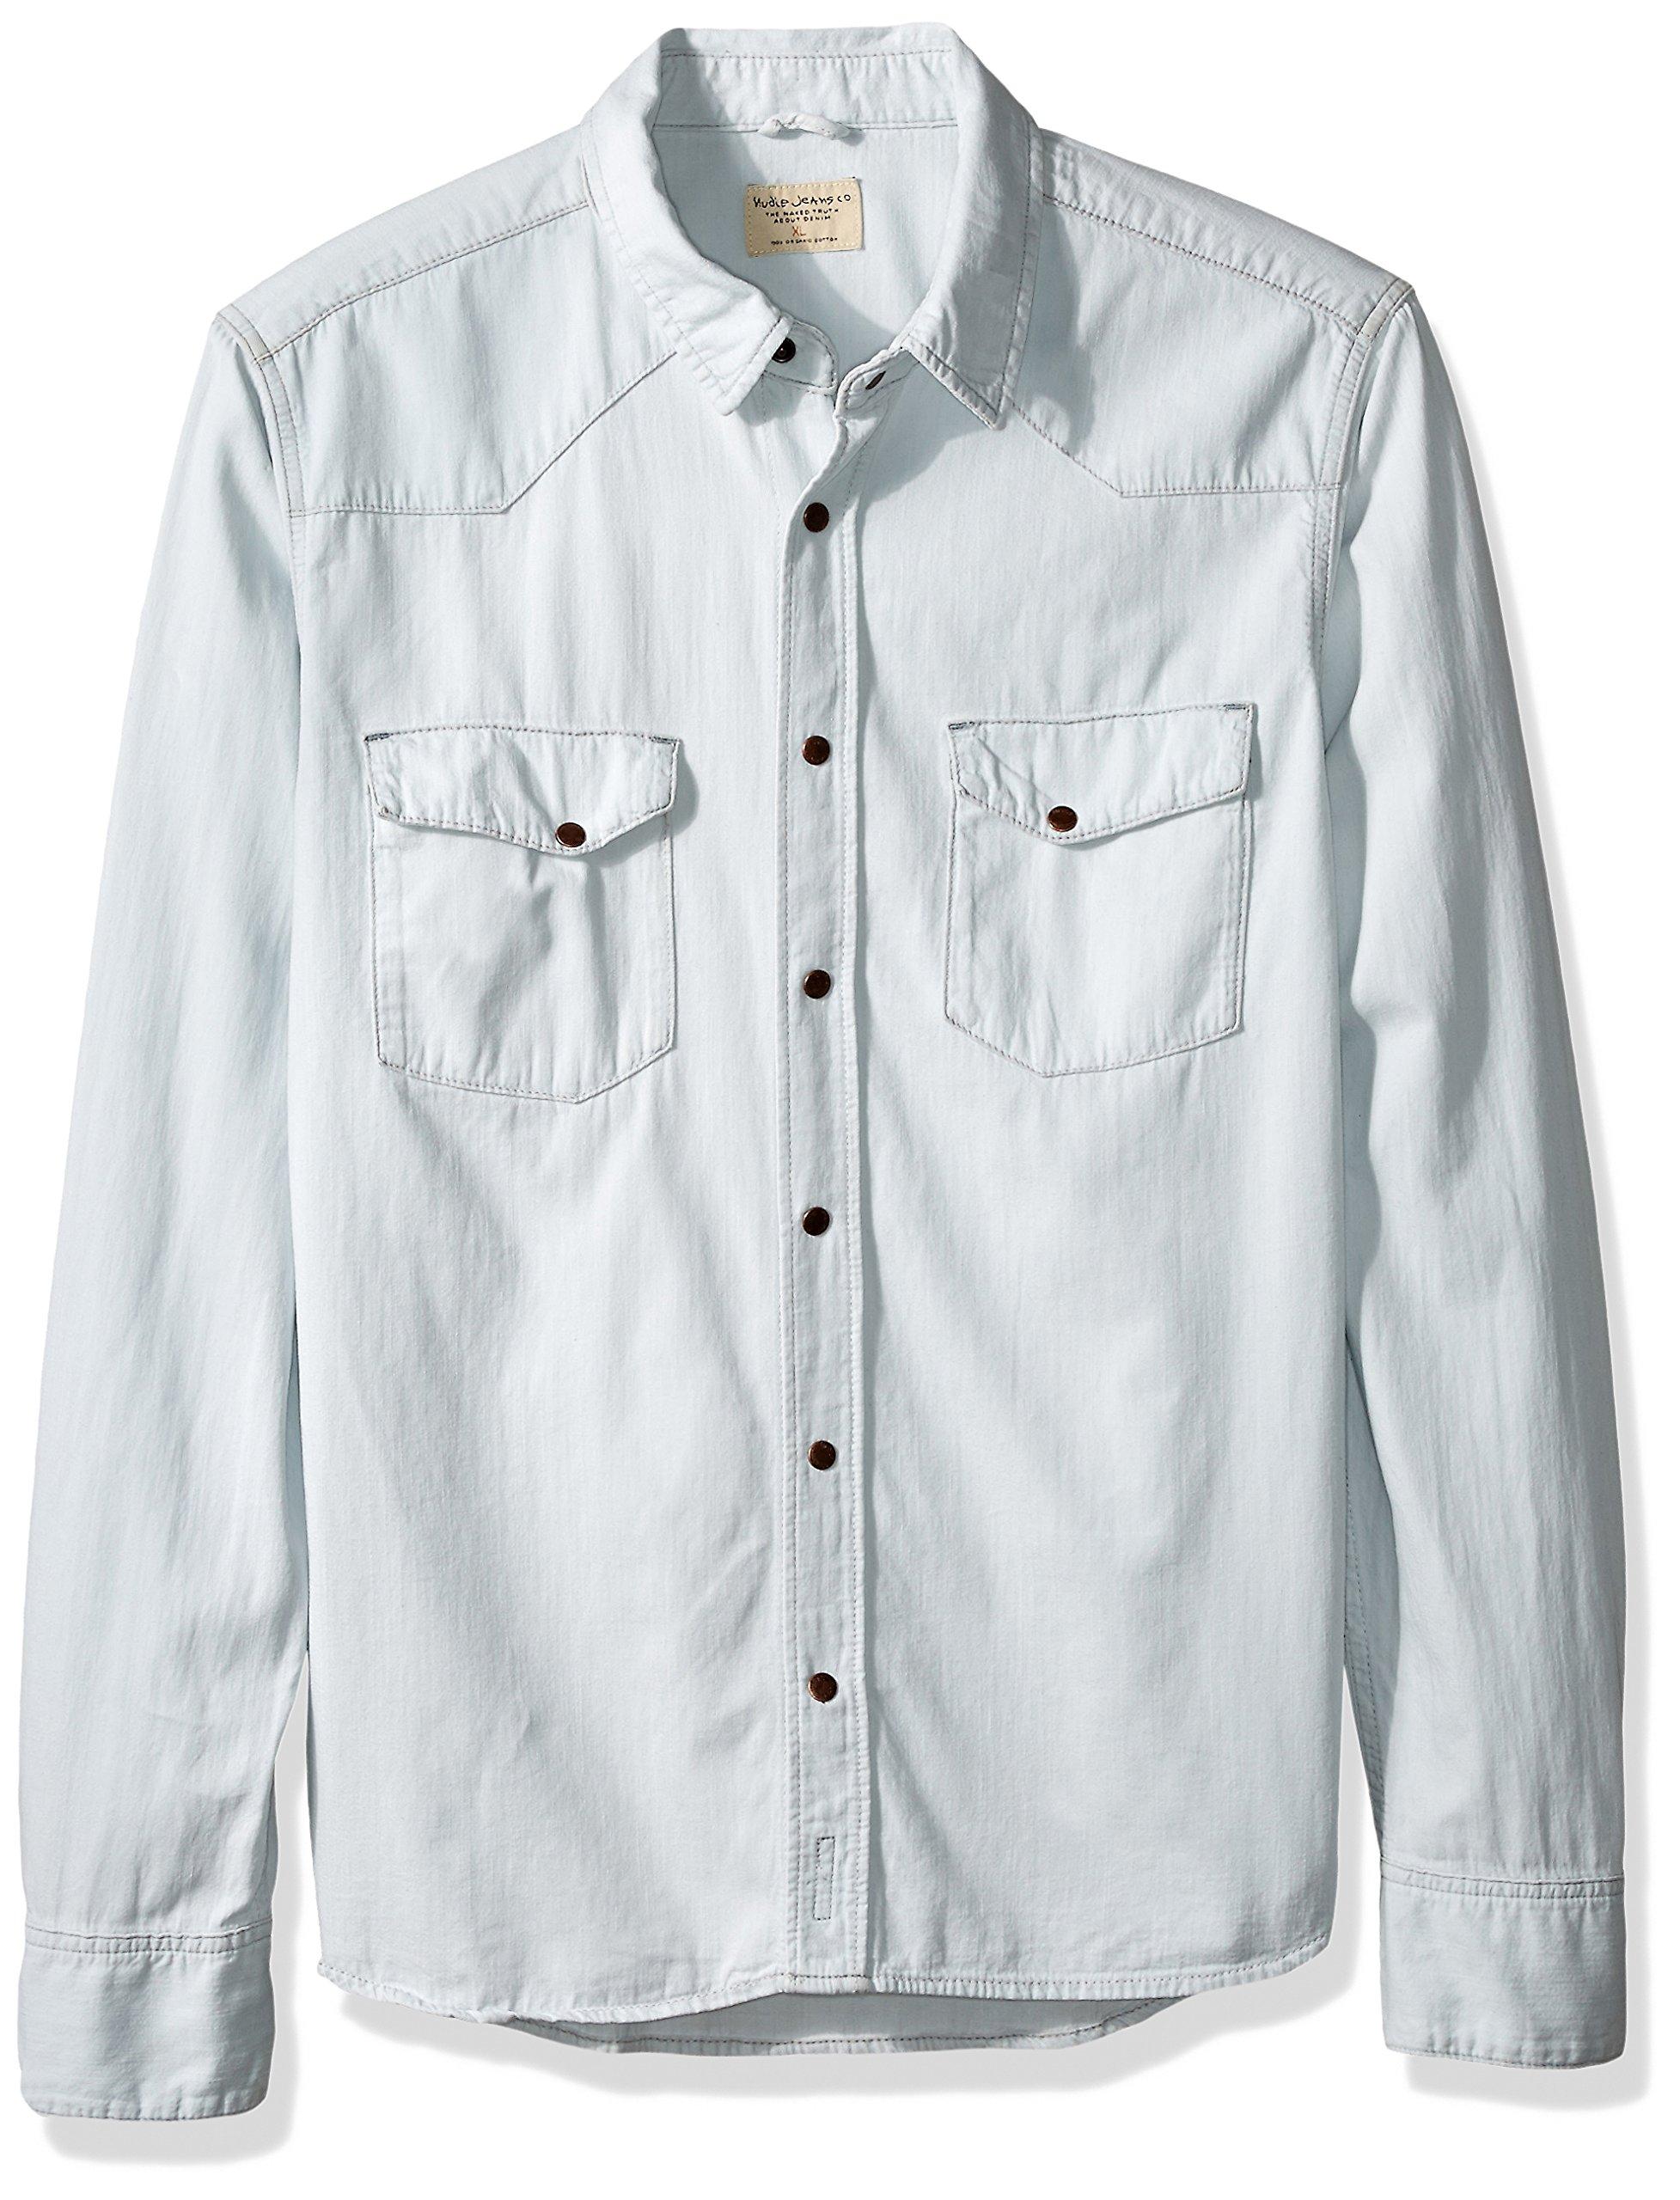 Nudie Jeans Men's jonis Denim Shirt, Faded Summer, Medium